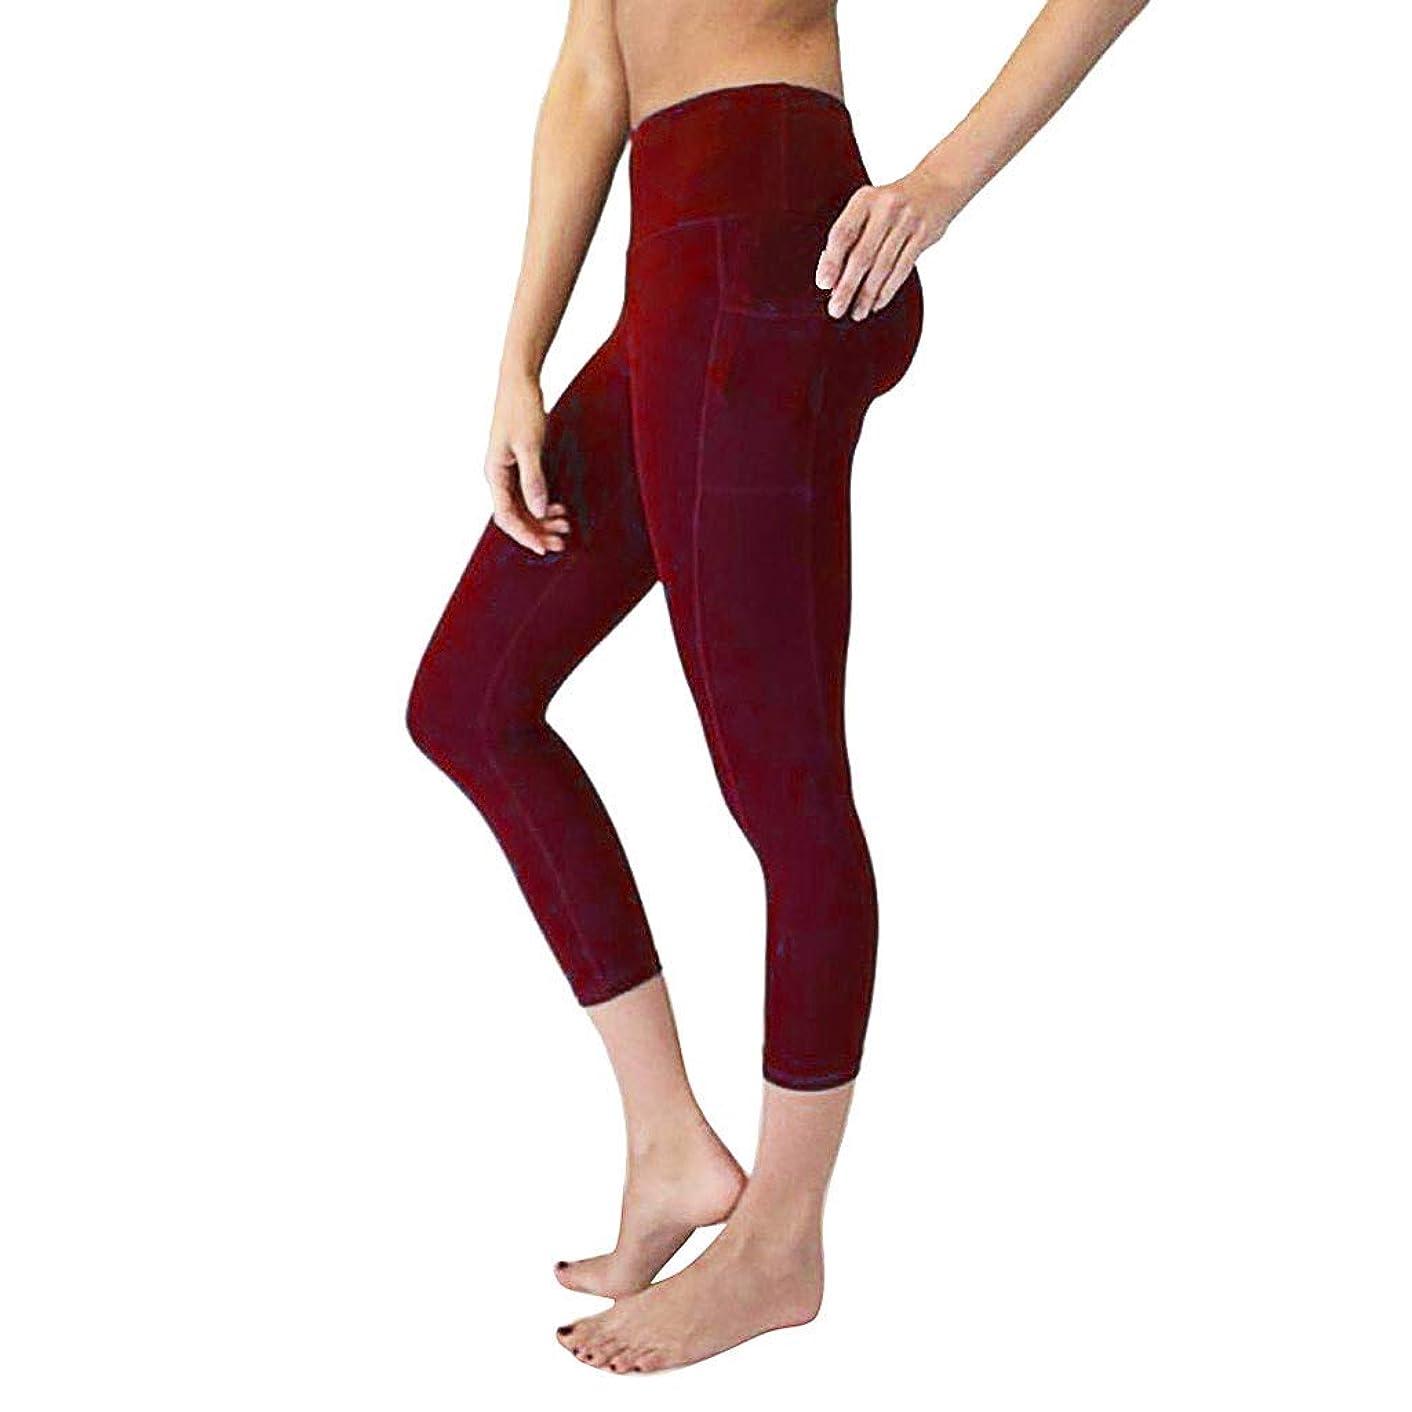 Women Yoga Pants High-Waist Tummy Control w Pocket Tummy Control Leggings 4 Way Stretch Soft & Slim Active Pants Valentine's Day (Wine, M)